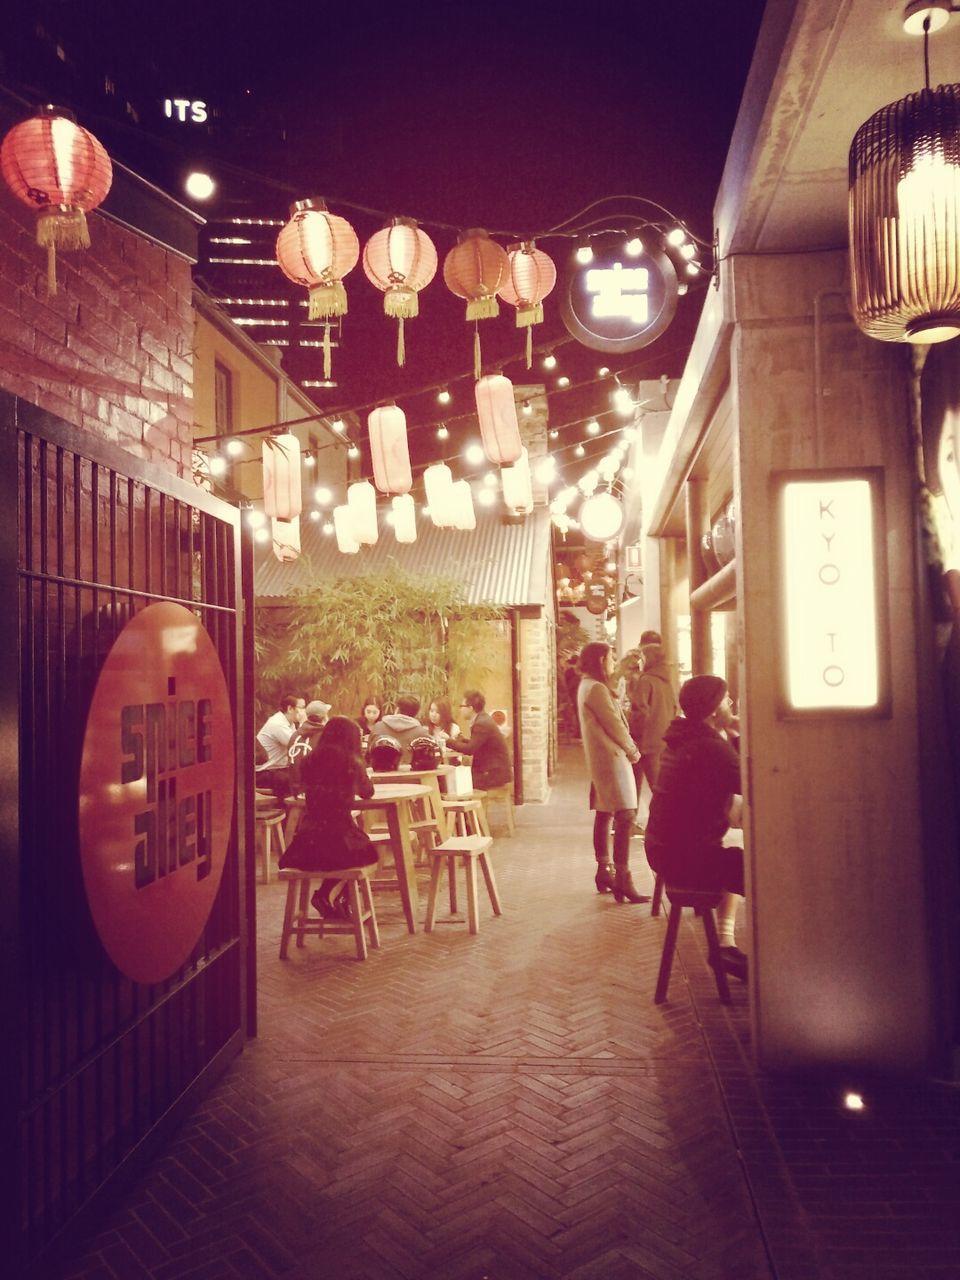 restaurant, illuminated, night, cafe, city, architecture, friendship, men, people, outdoors, adult